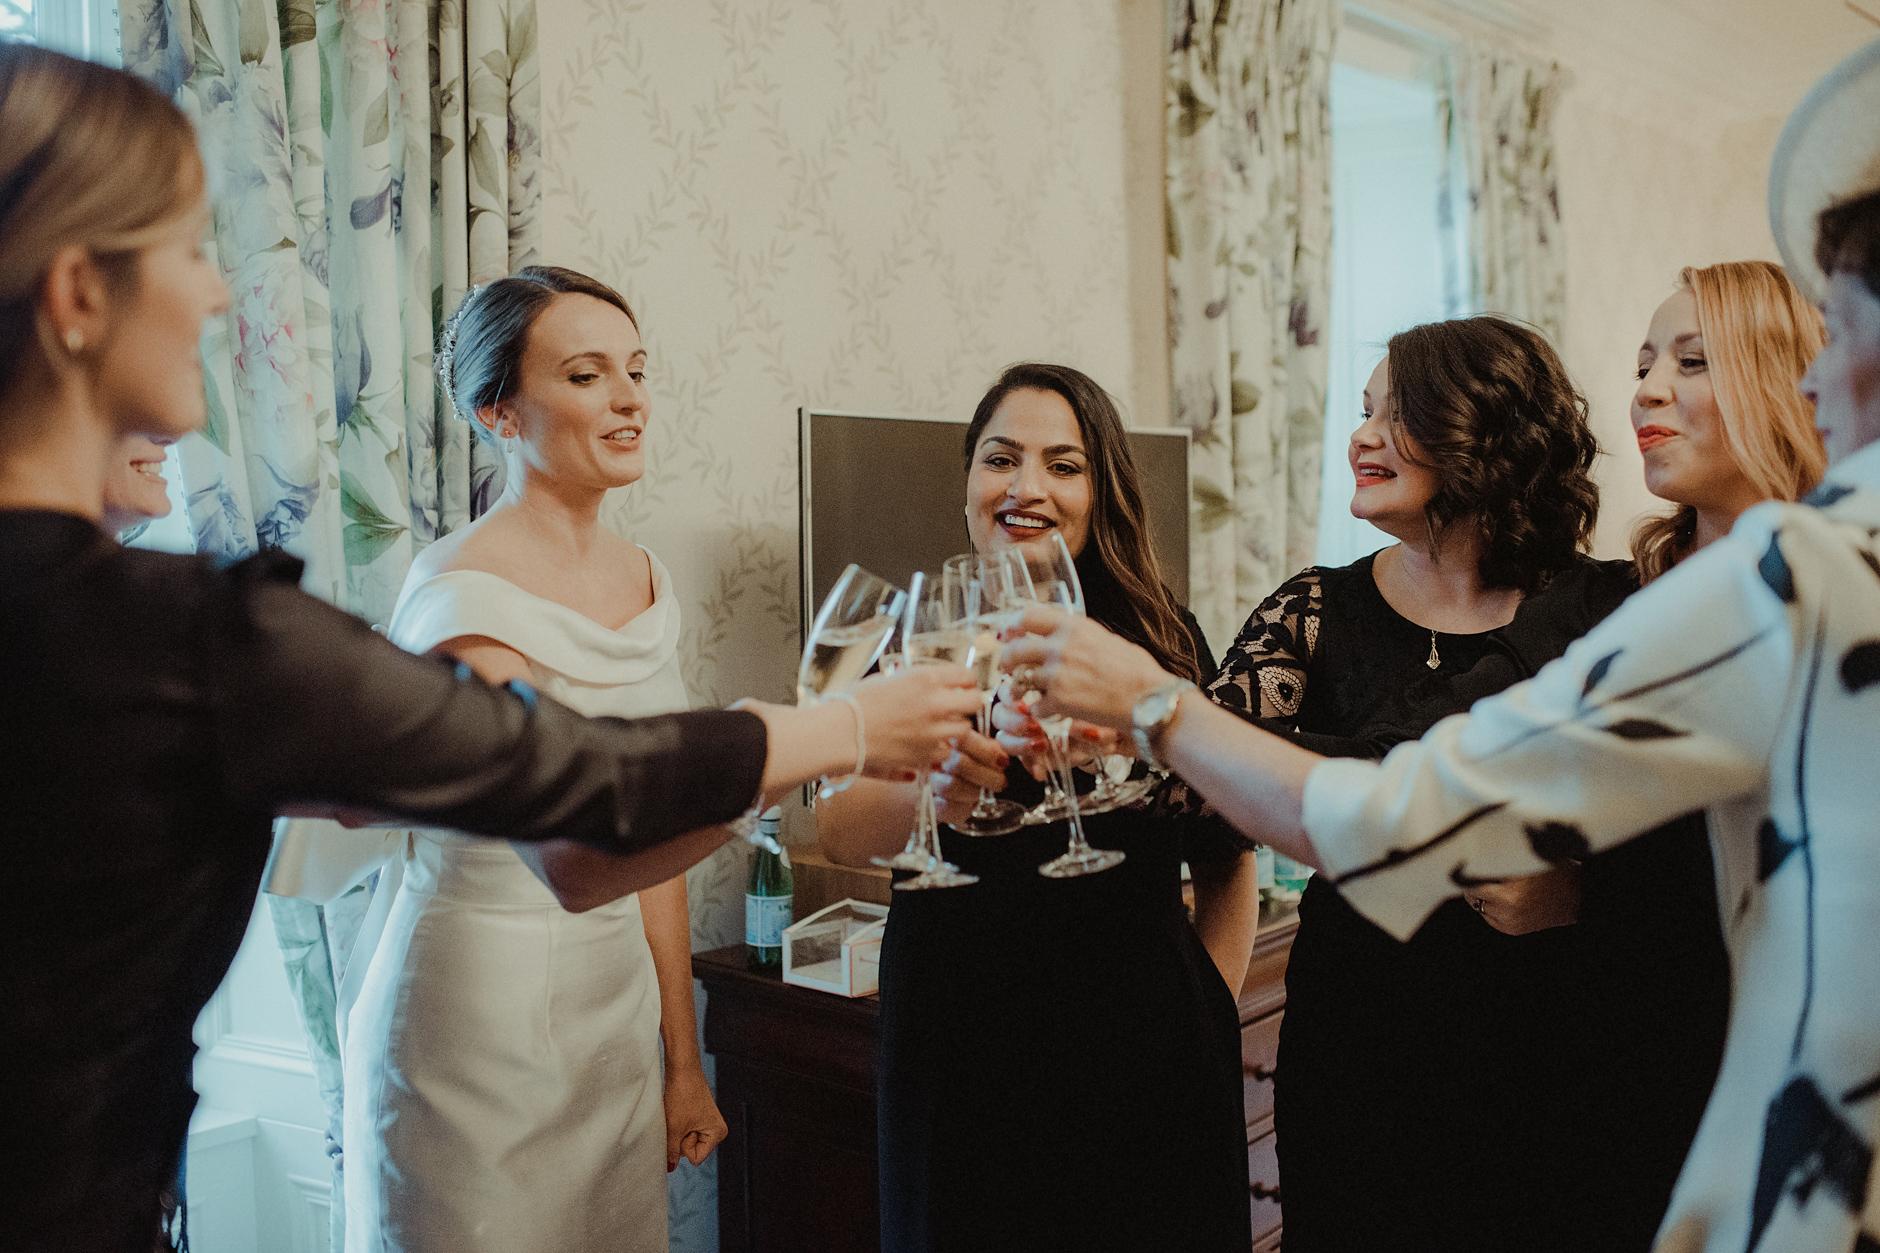 Glentruim-Wedding-Nikki-Leadbetter-Photography-56.jpg